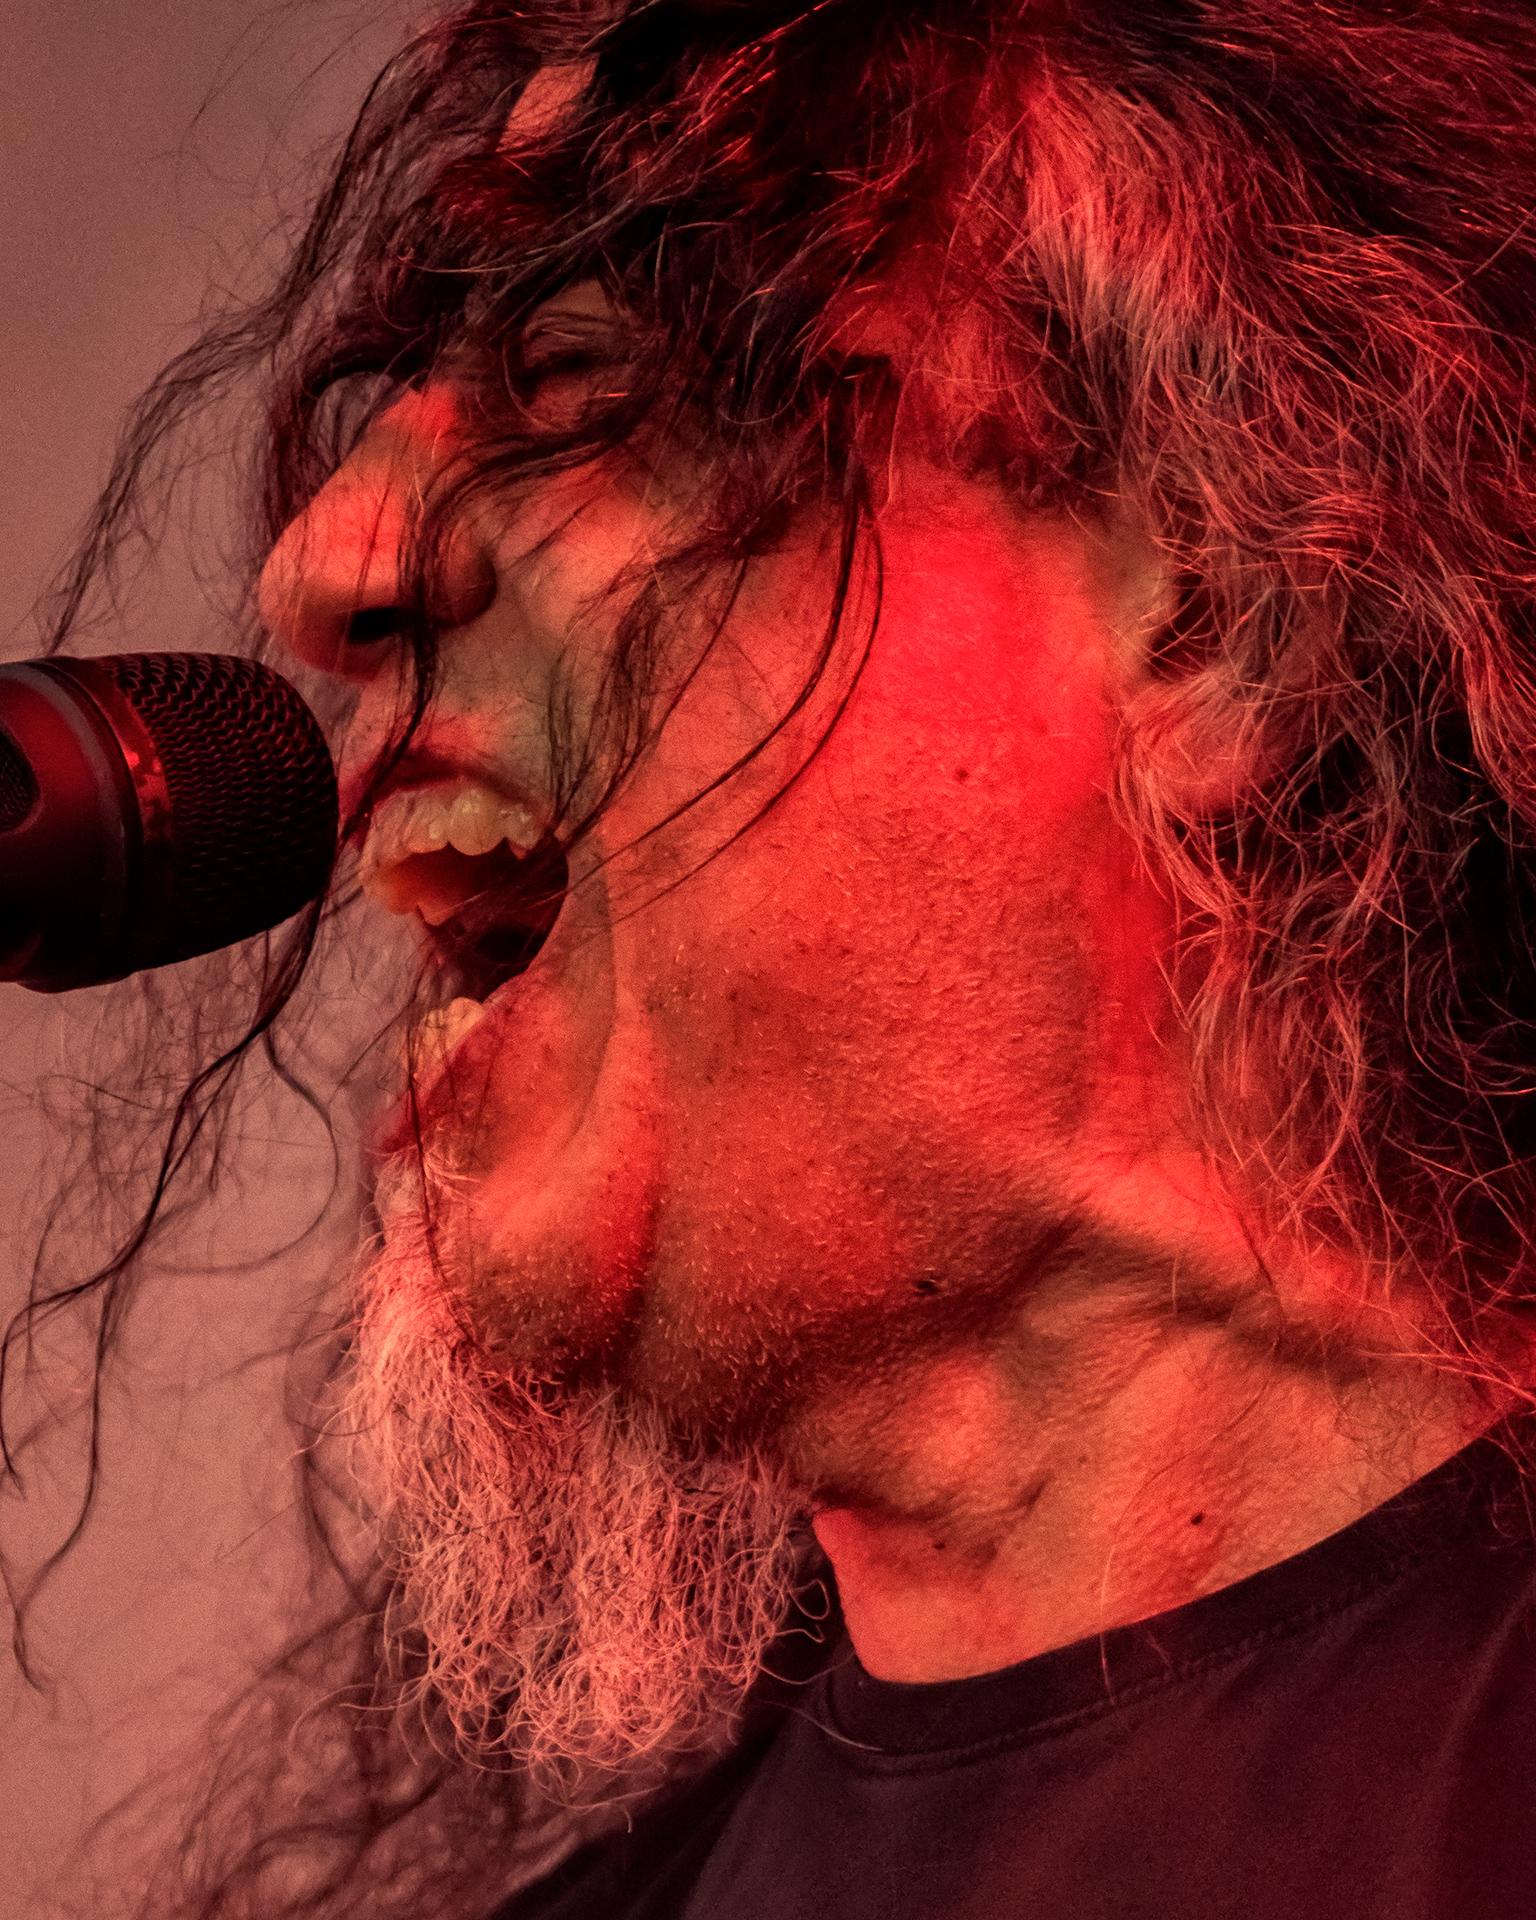 Tom Araya, Slayer band vocalist, Tuska metal festival